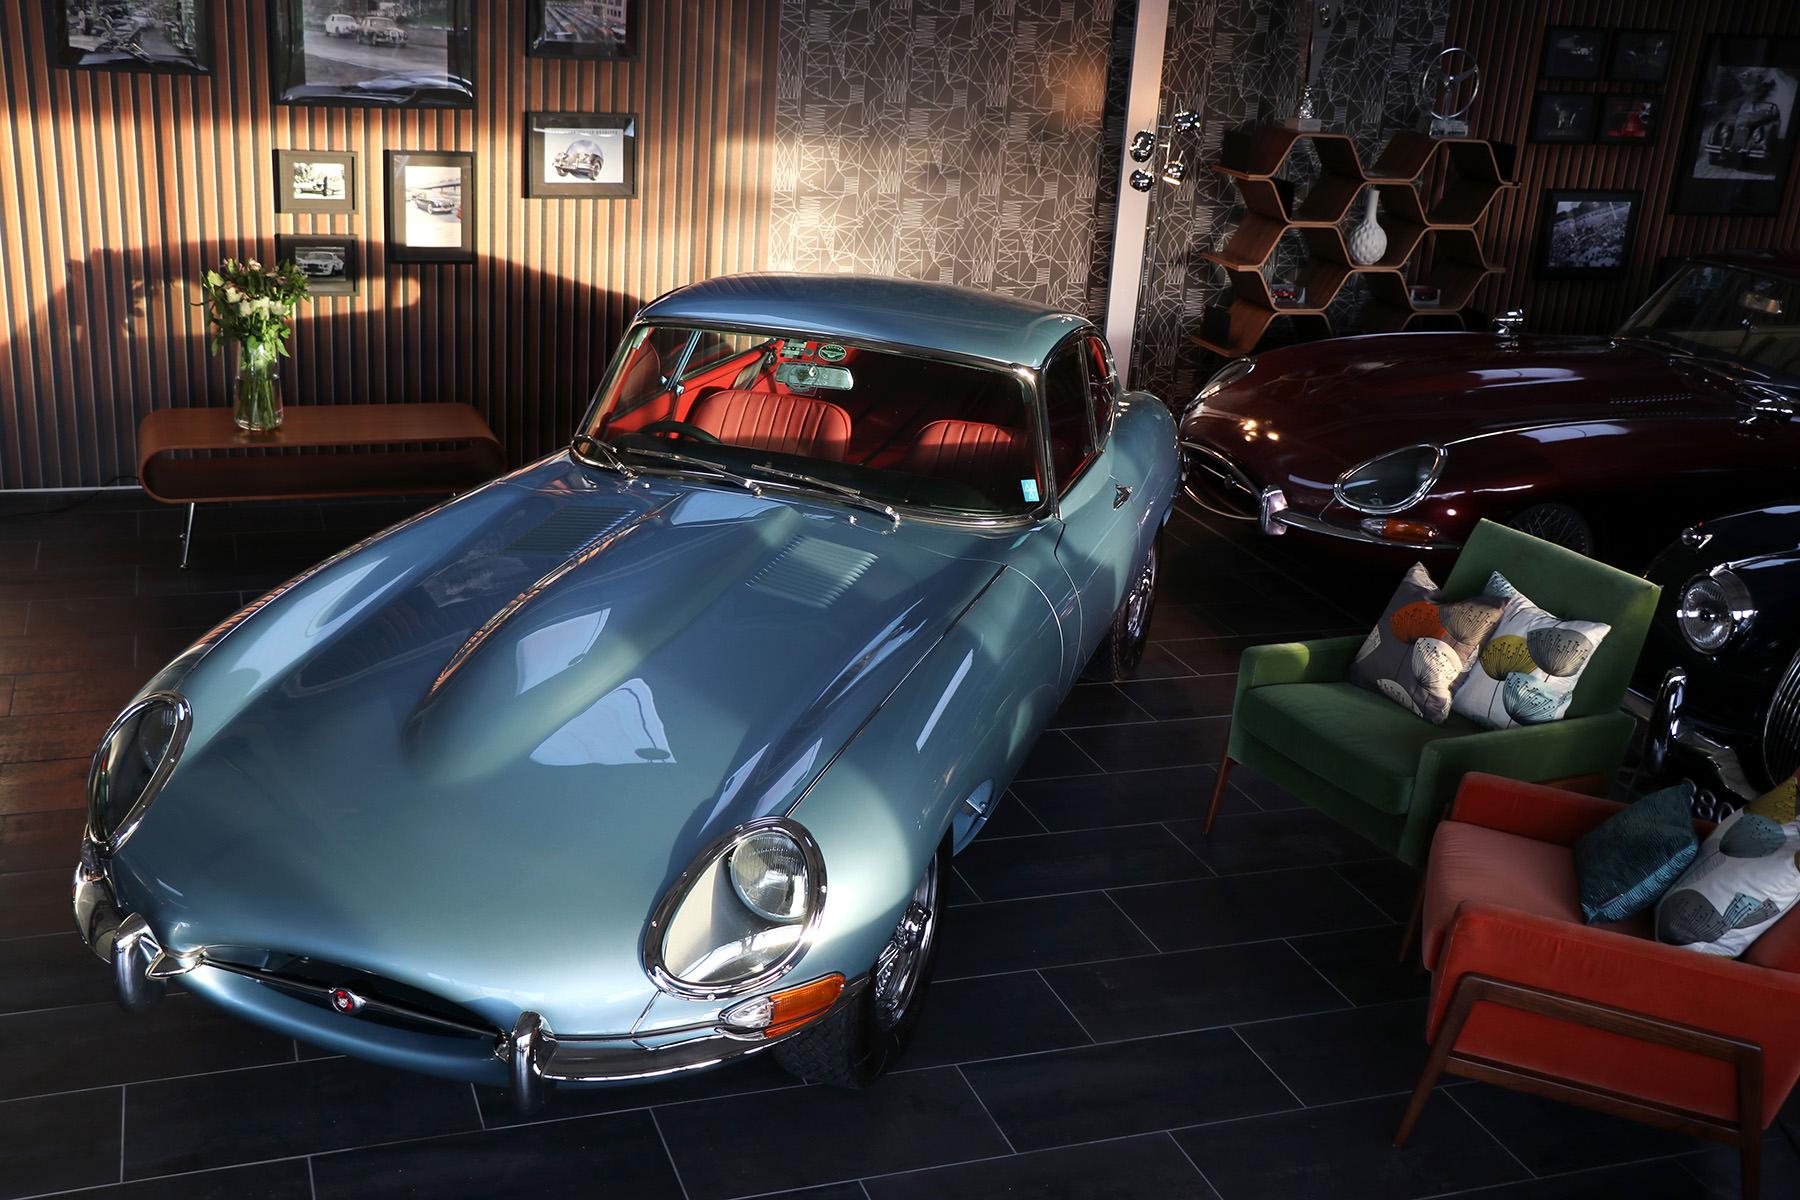 1966_opalescent_silver_blue_Jaguar_Sayer_etype_series _I_2_resized.jpg